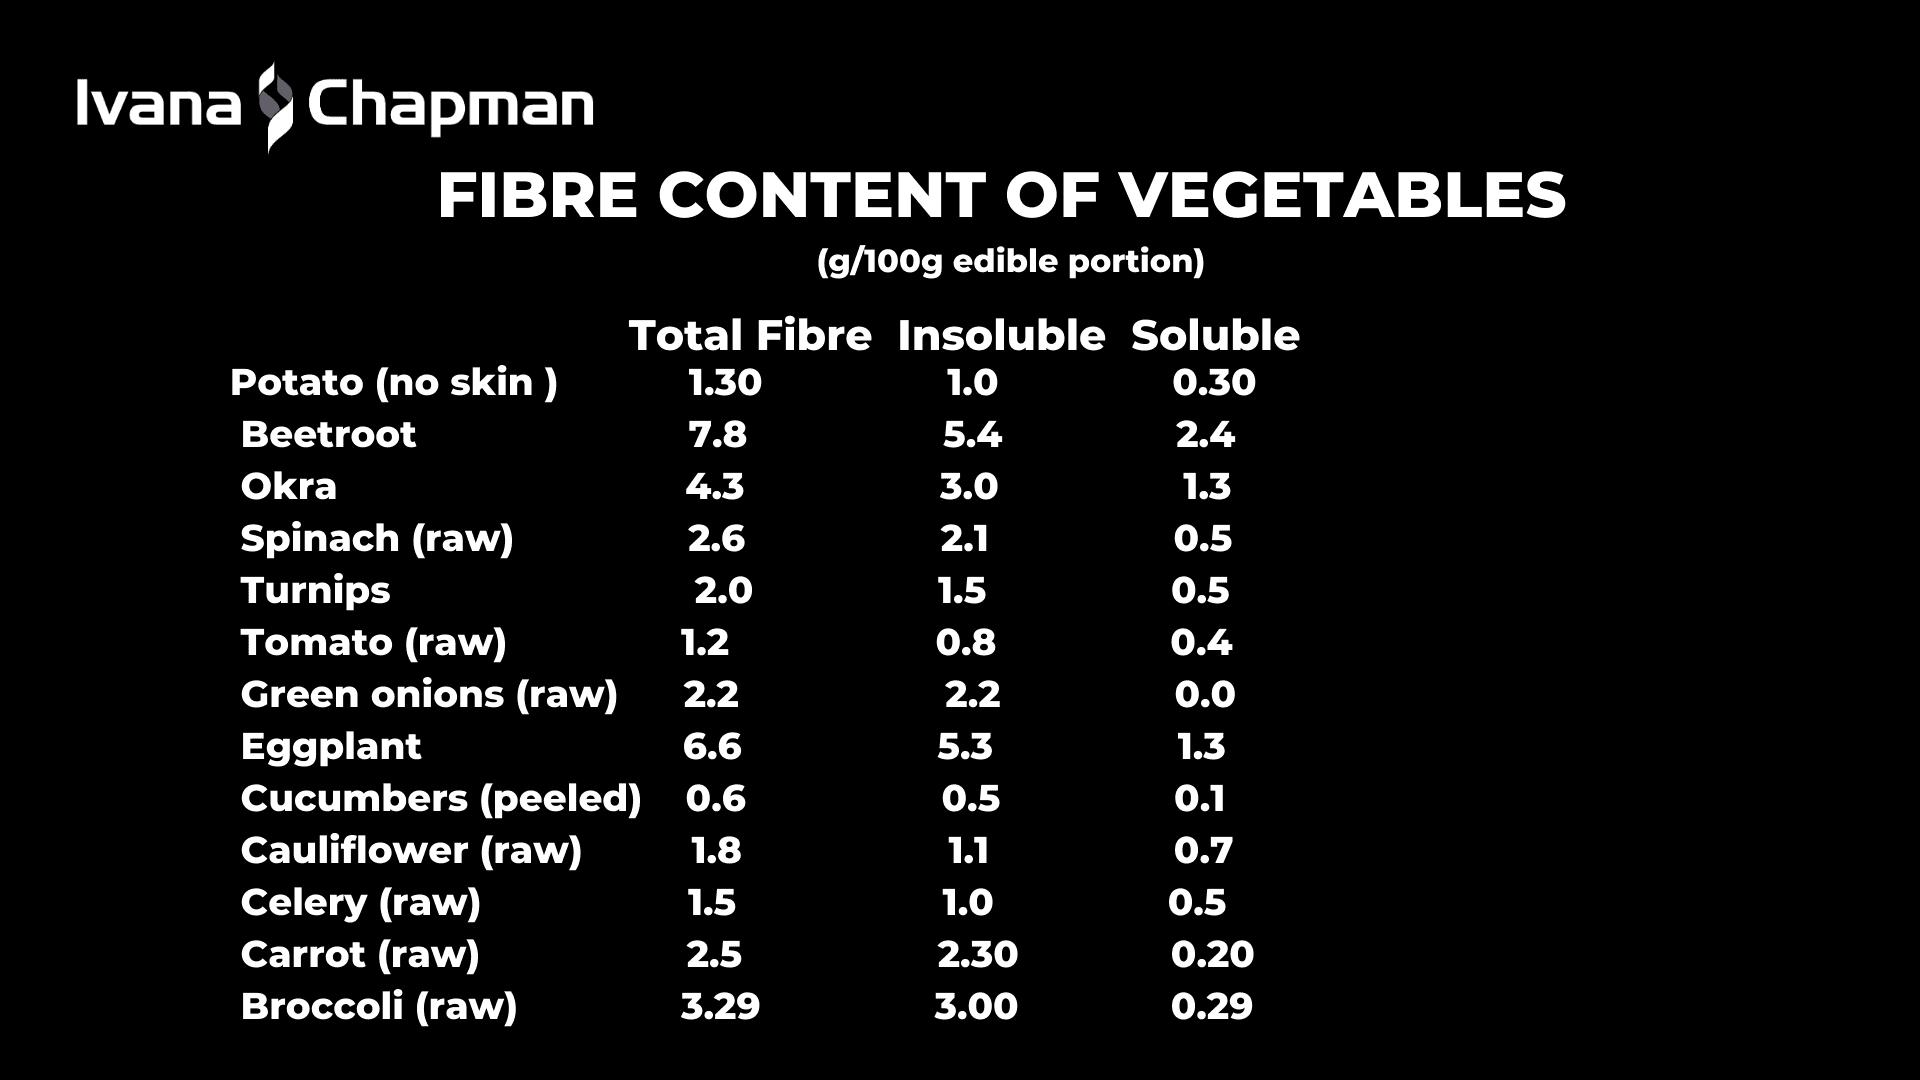 add-more-fibre-content-of-vegetables